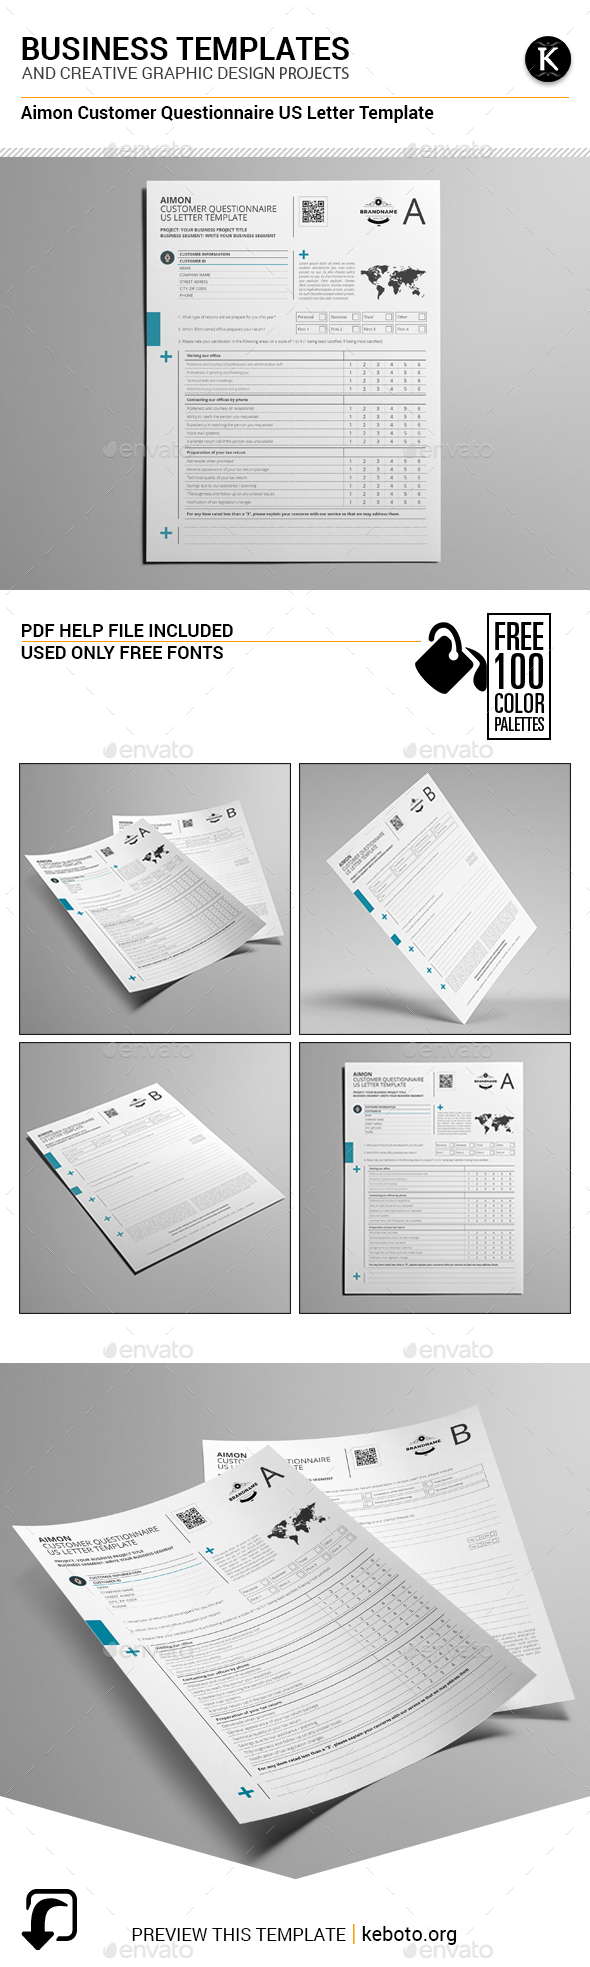 Aimon Customer Questionnaire US Letter Template - Miscellaneous Print Templates